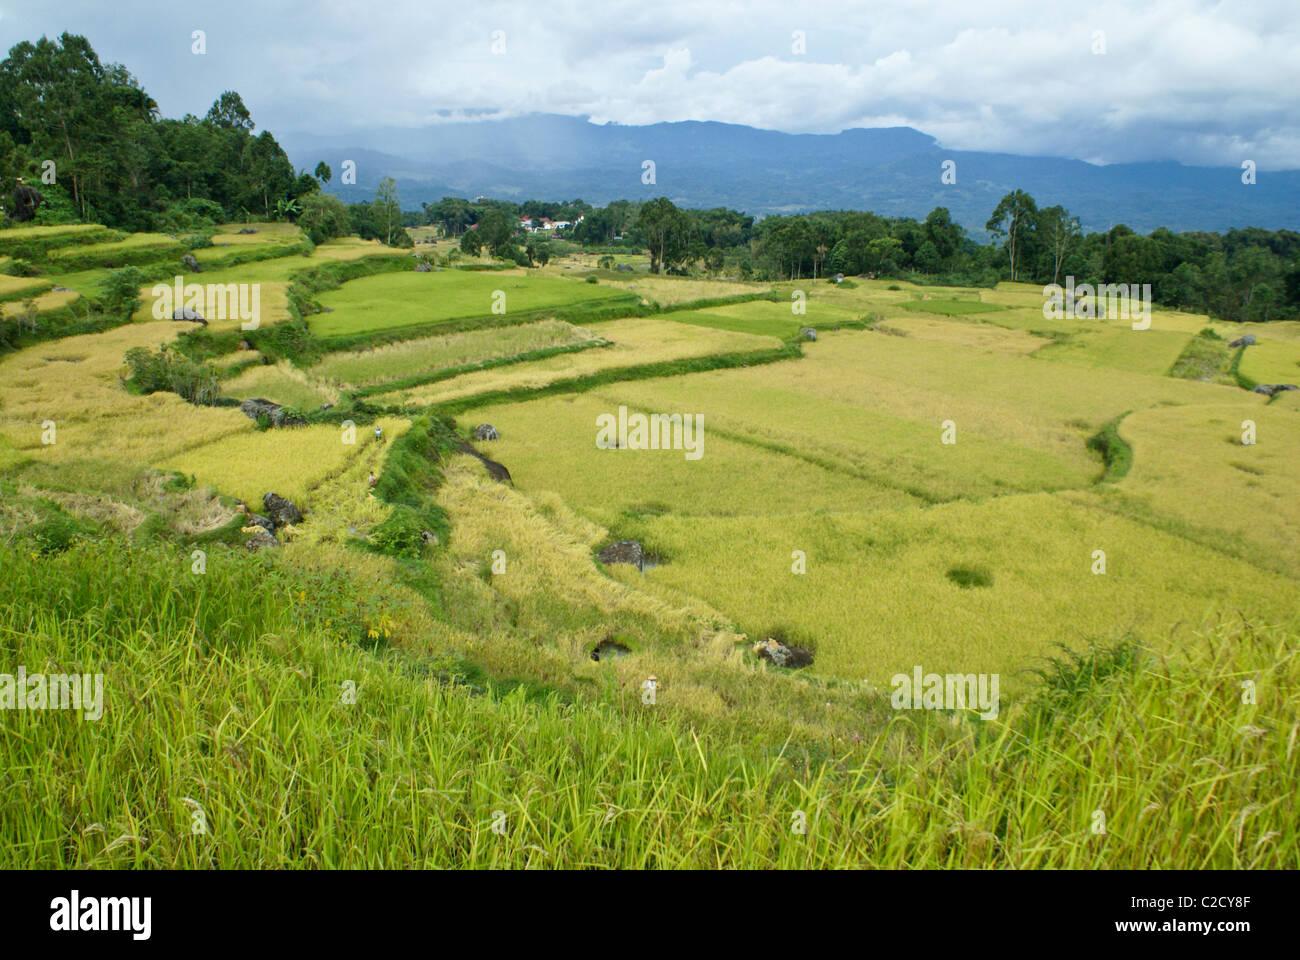 Rice terraces, Tana Toraja, South Sulawesi, Indonesia - Stock Image